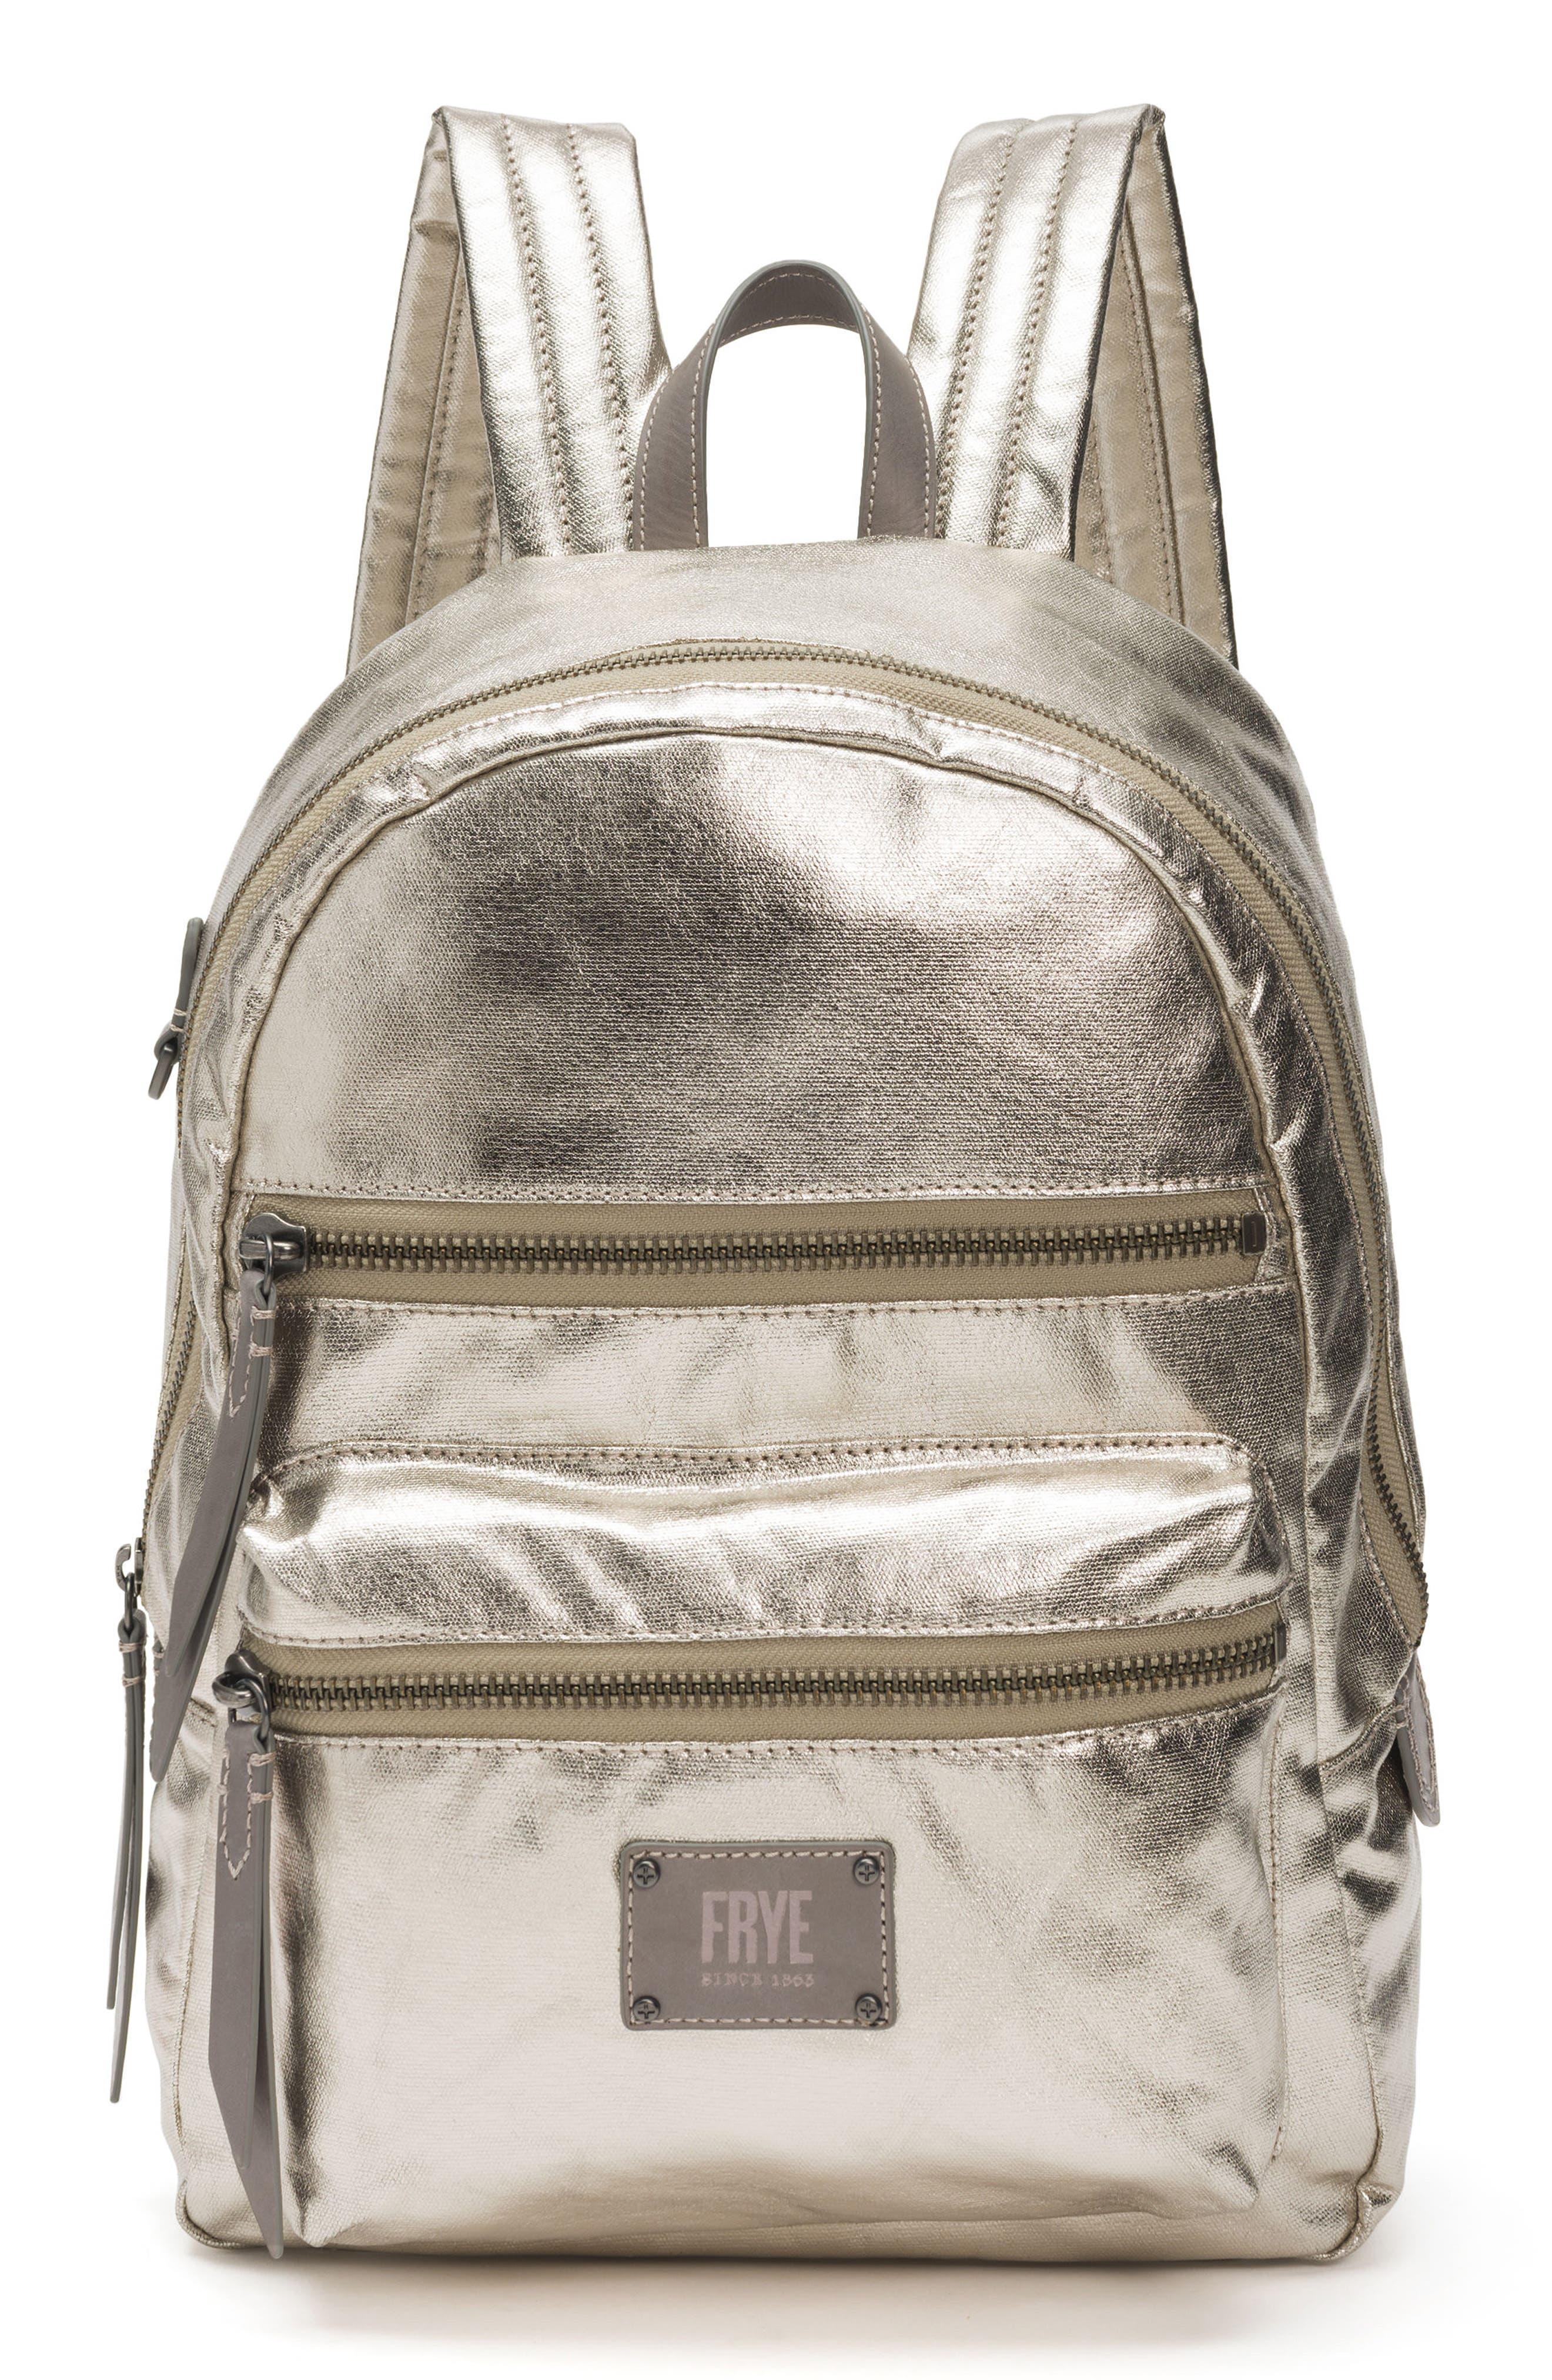 Ivy Metallic Nylon Backpack,                         Main,                         color, 020